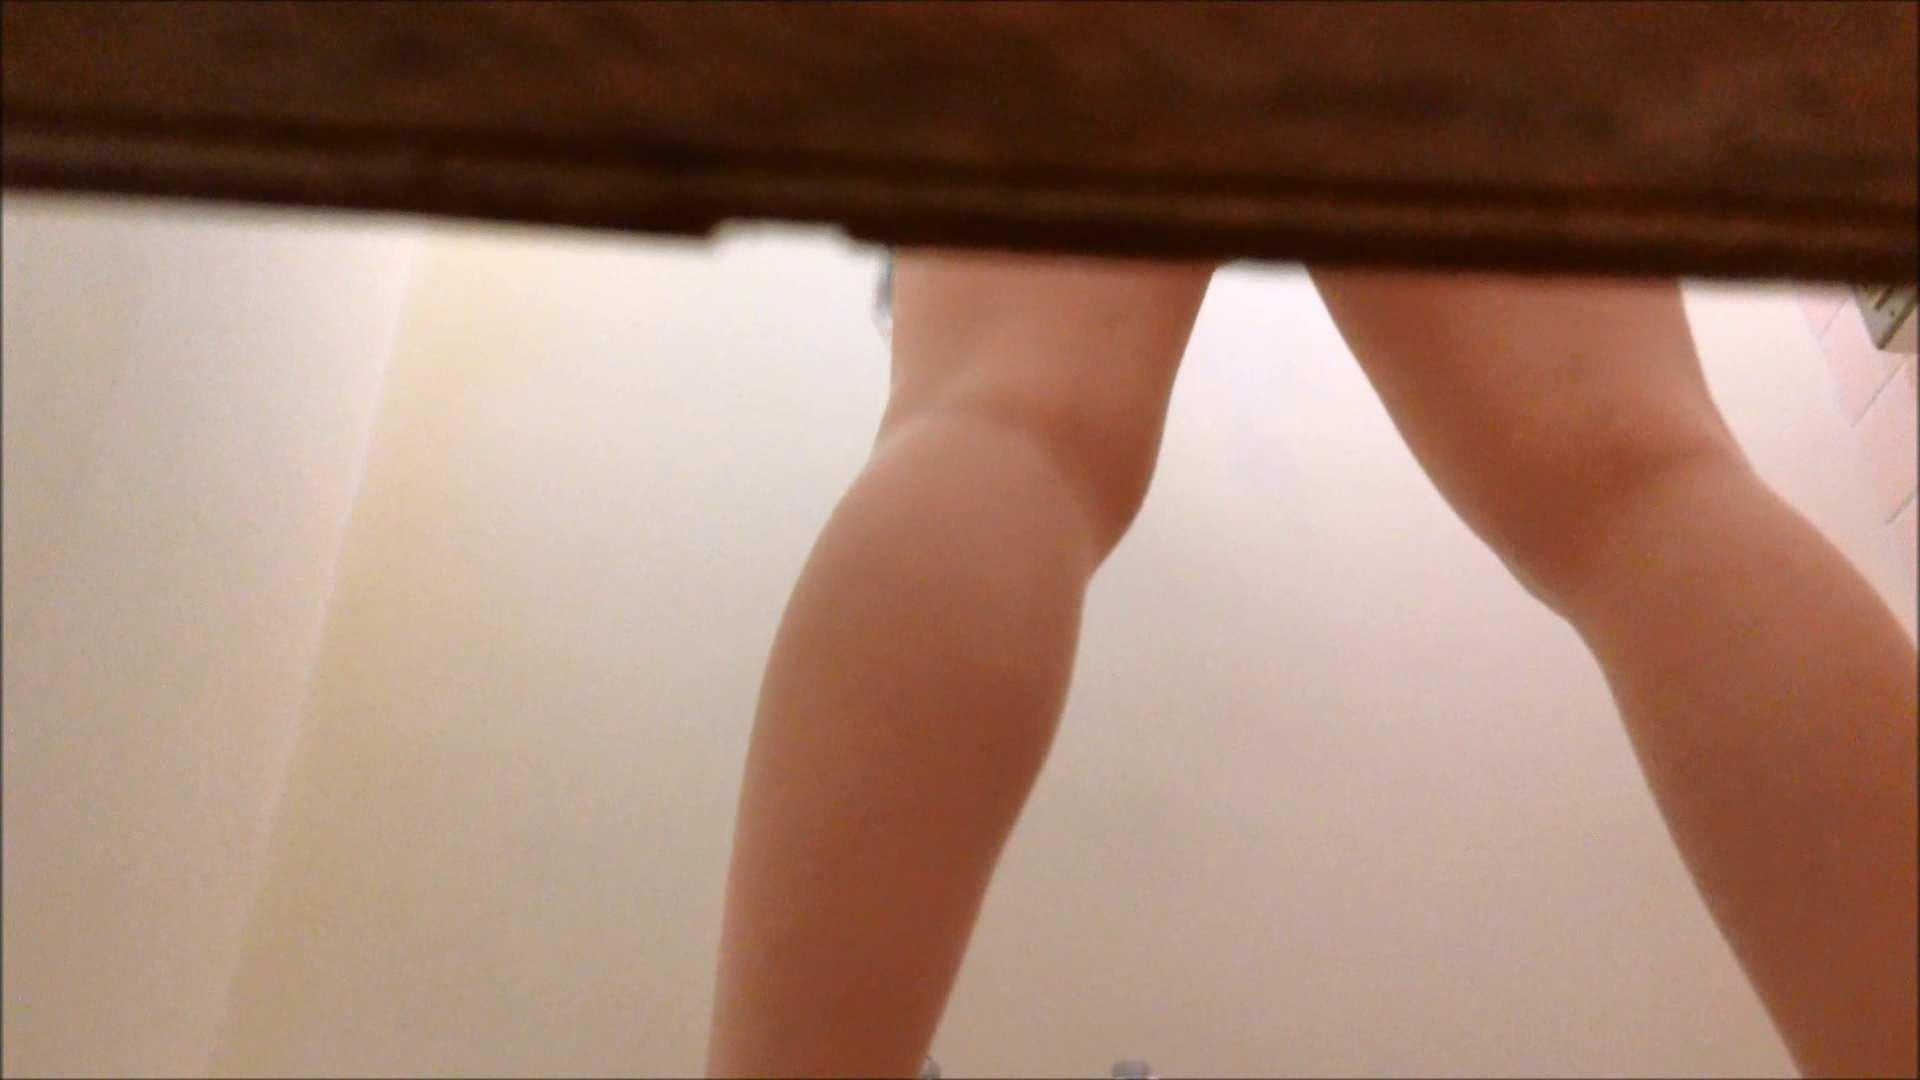 某有名大学女性洗面所 vol.14 和式 のぞき 105PIX 45